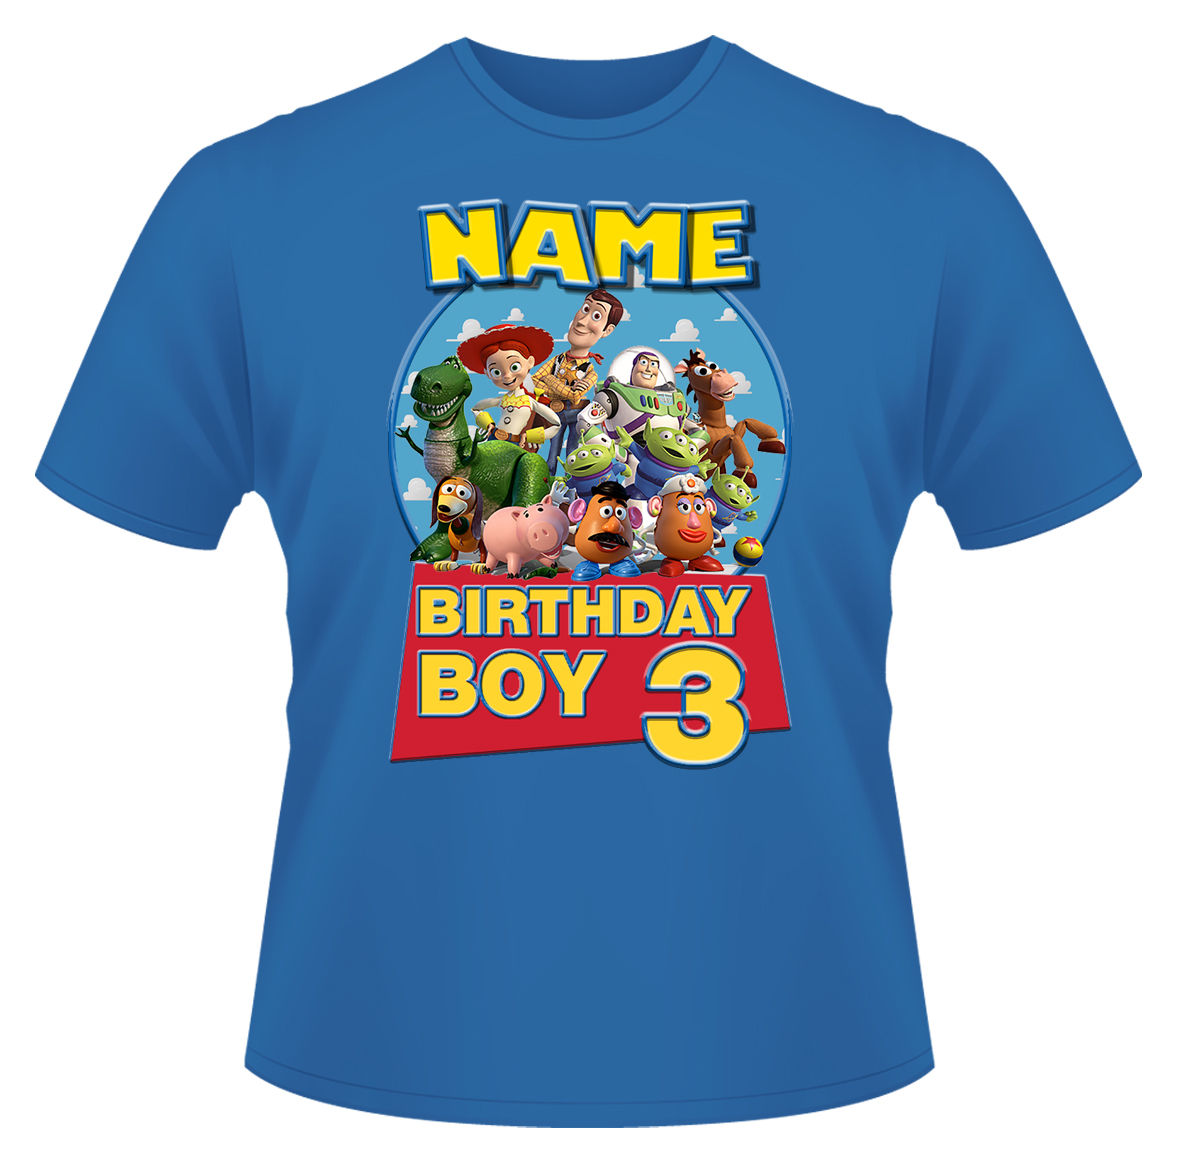 BOYS MENS  T Shirt TOP LEGEND DAB   T-Shirt Gamer PS4 XBOX FORT F1 BATTLE